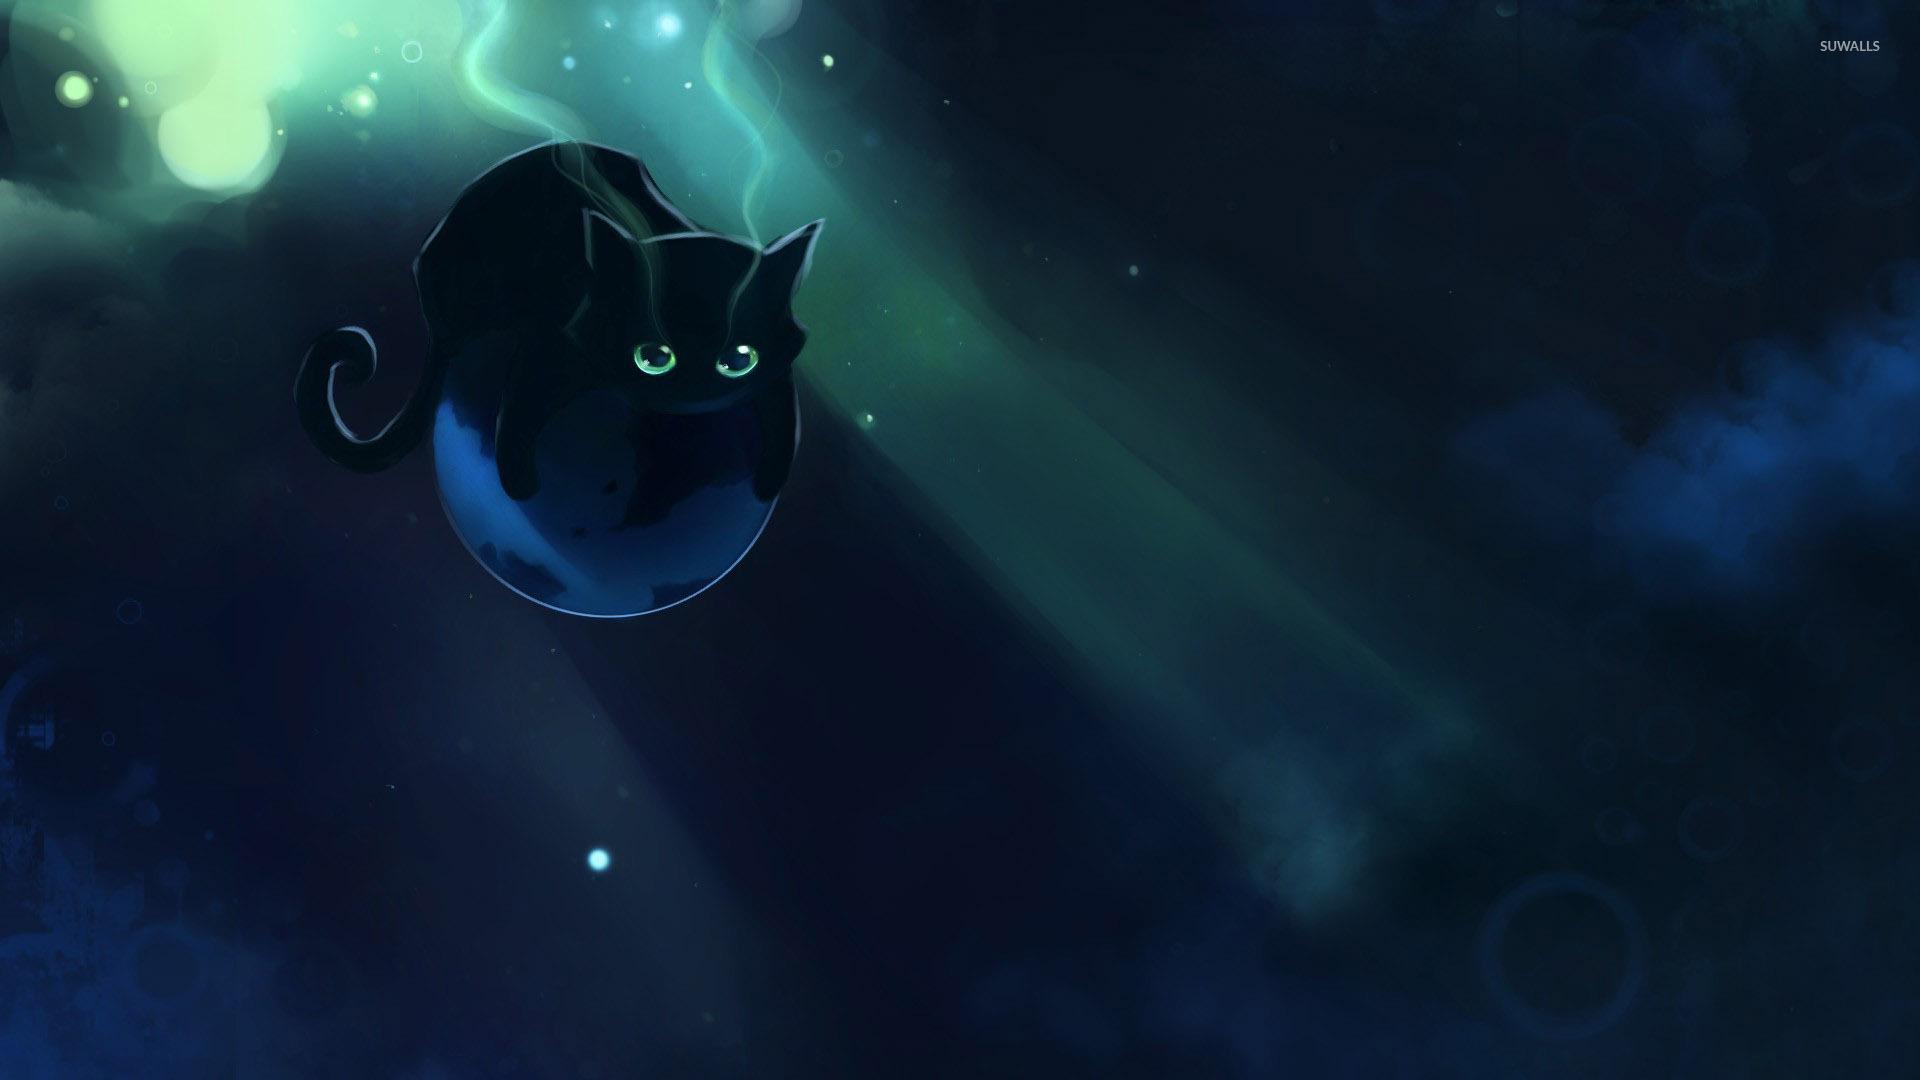 Most Inspiring Wallpaper Halloween Kitten - black-kitten-floating-on-a-planet-49617-1920x1080  Snapshot_866480.jpg